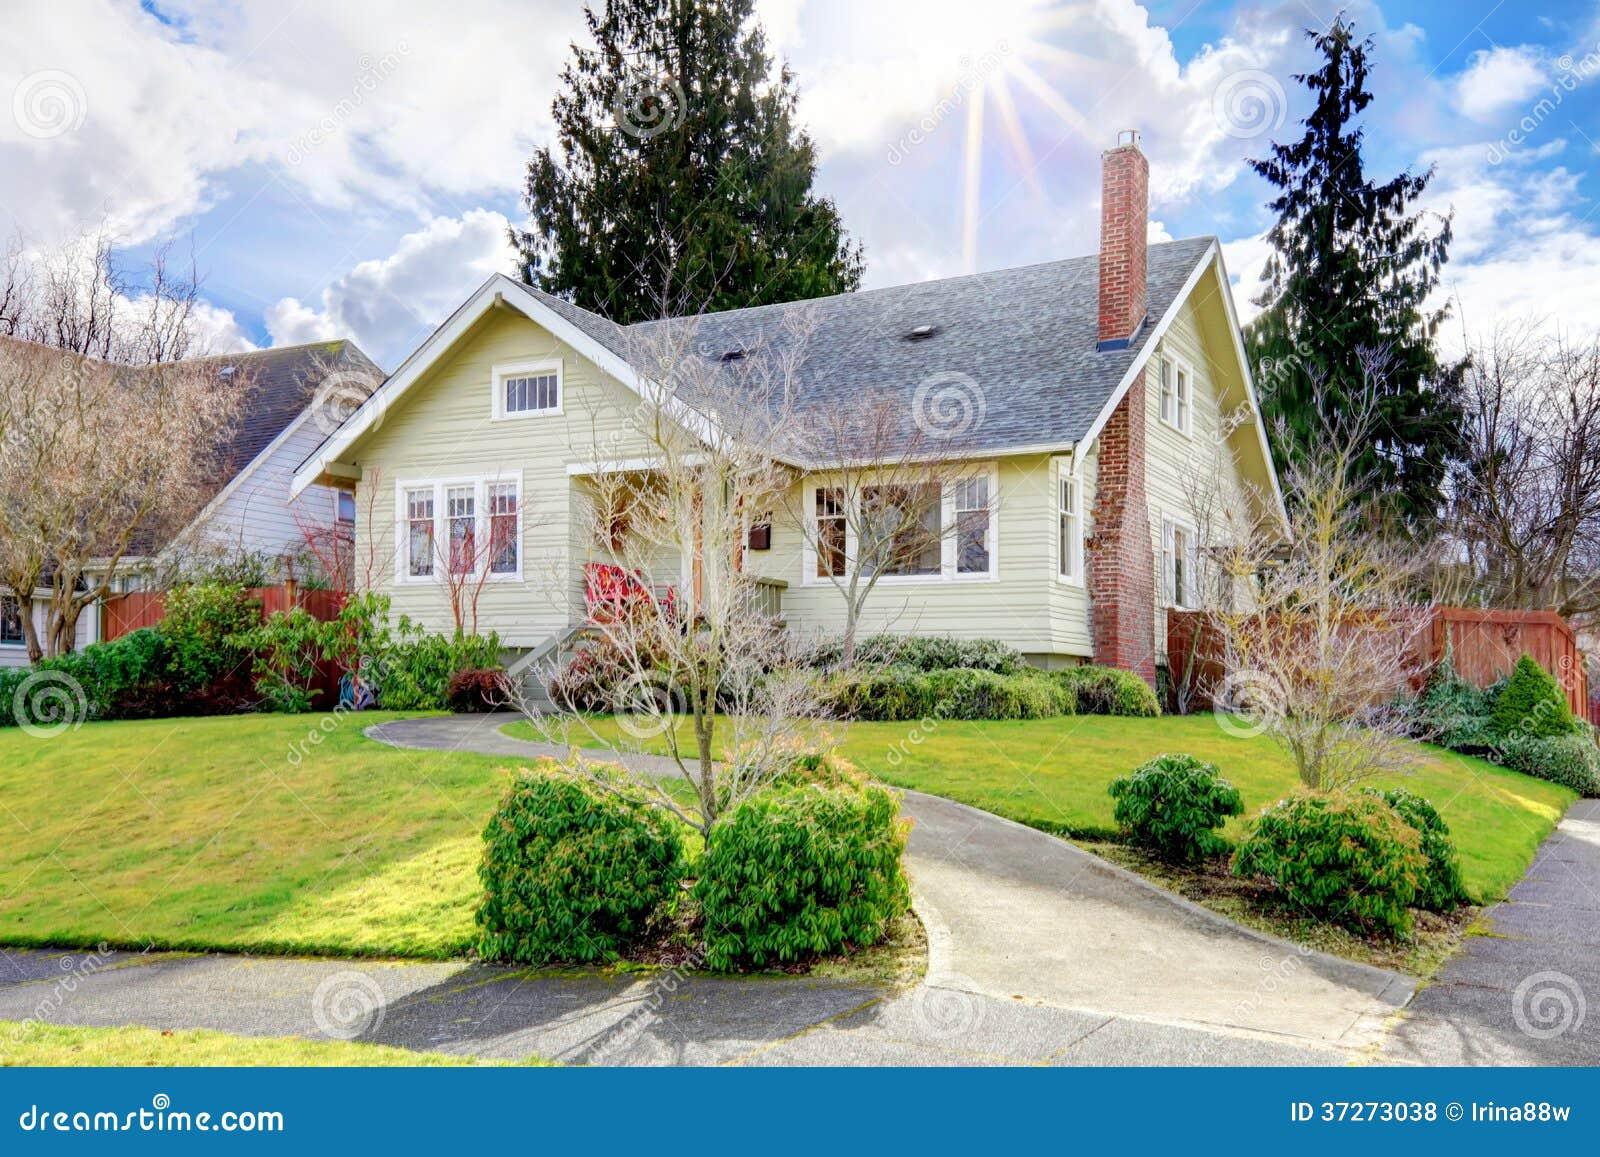 American Yellow Siding House Royalty Free Stock Photos